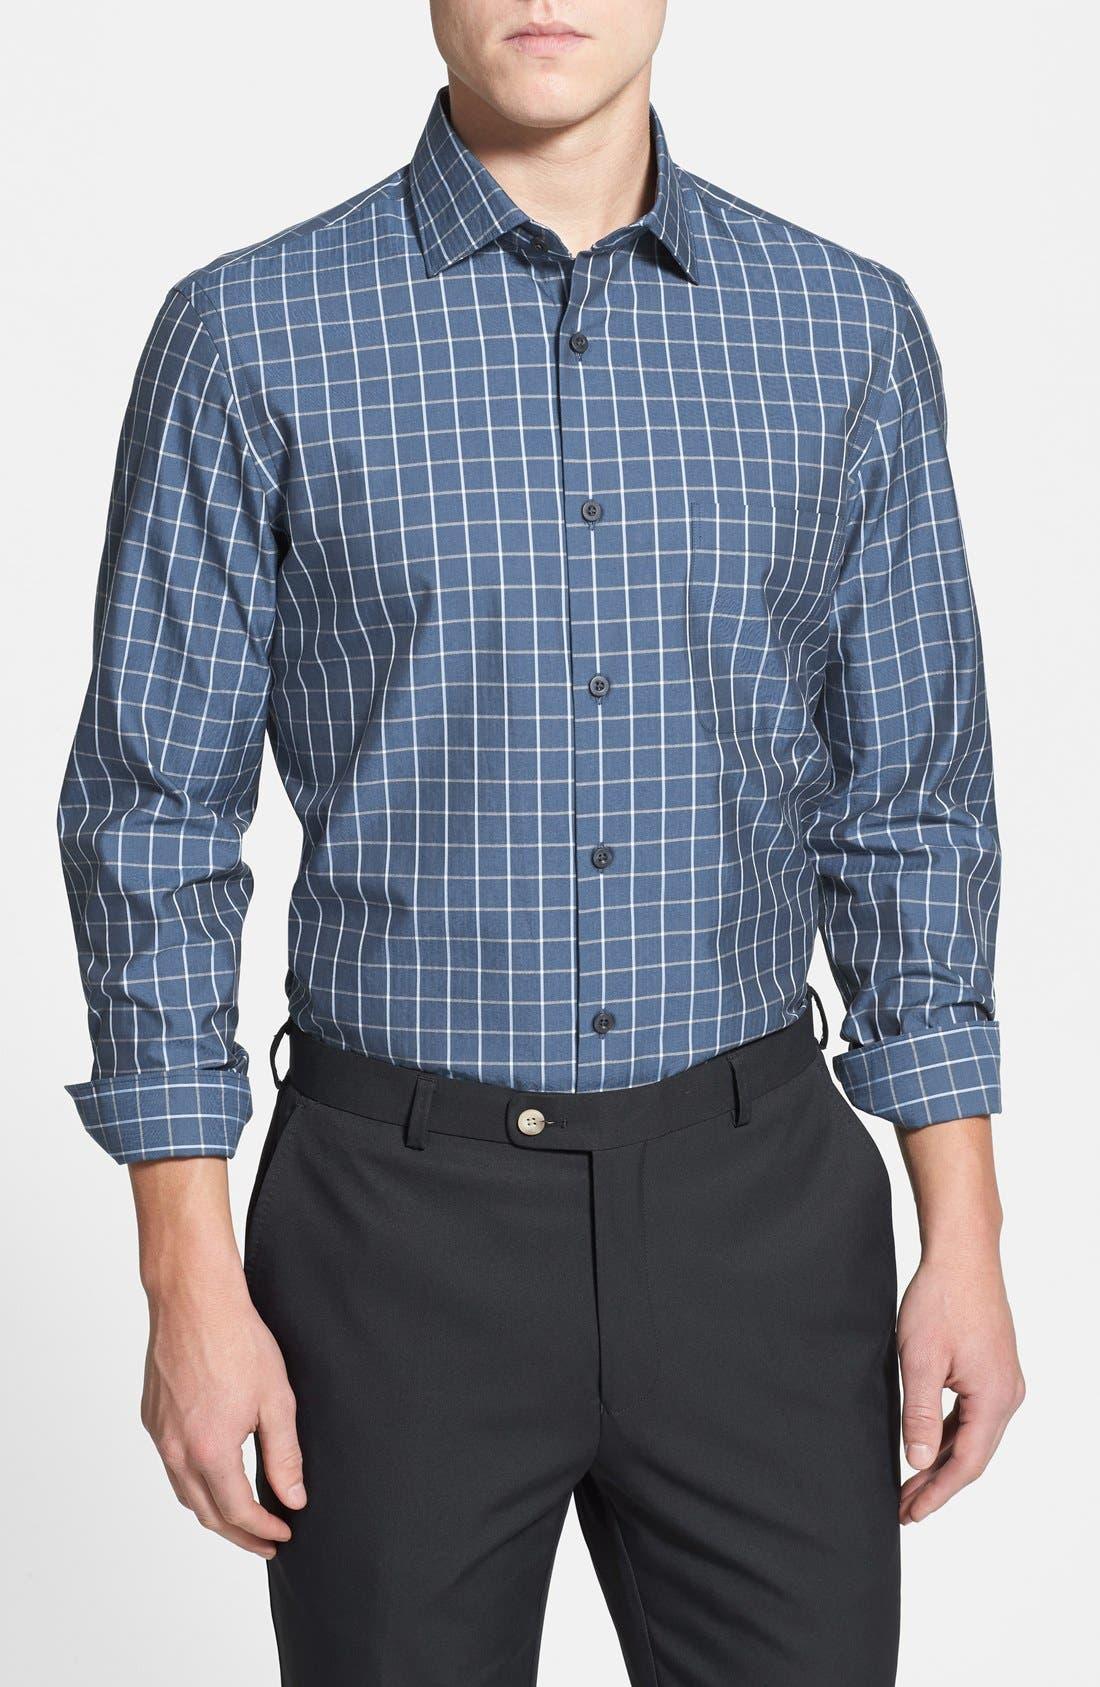 Alternate Image 1 Selected - John W. Nordstrom® Regular Fit Supima® Cotton Sport Shirt